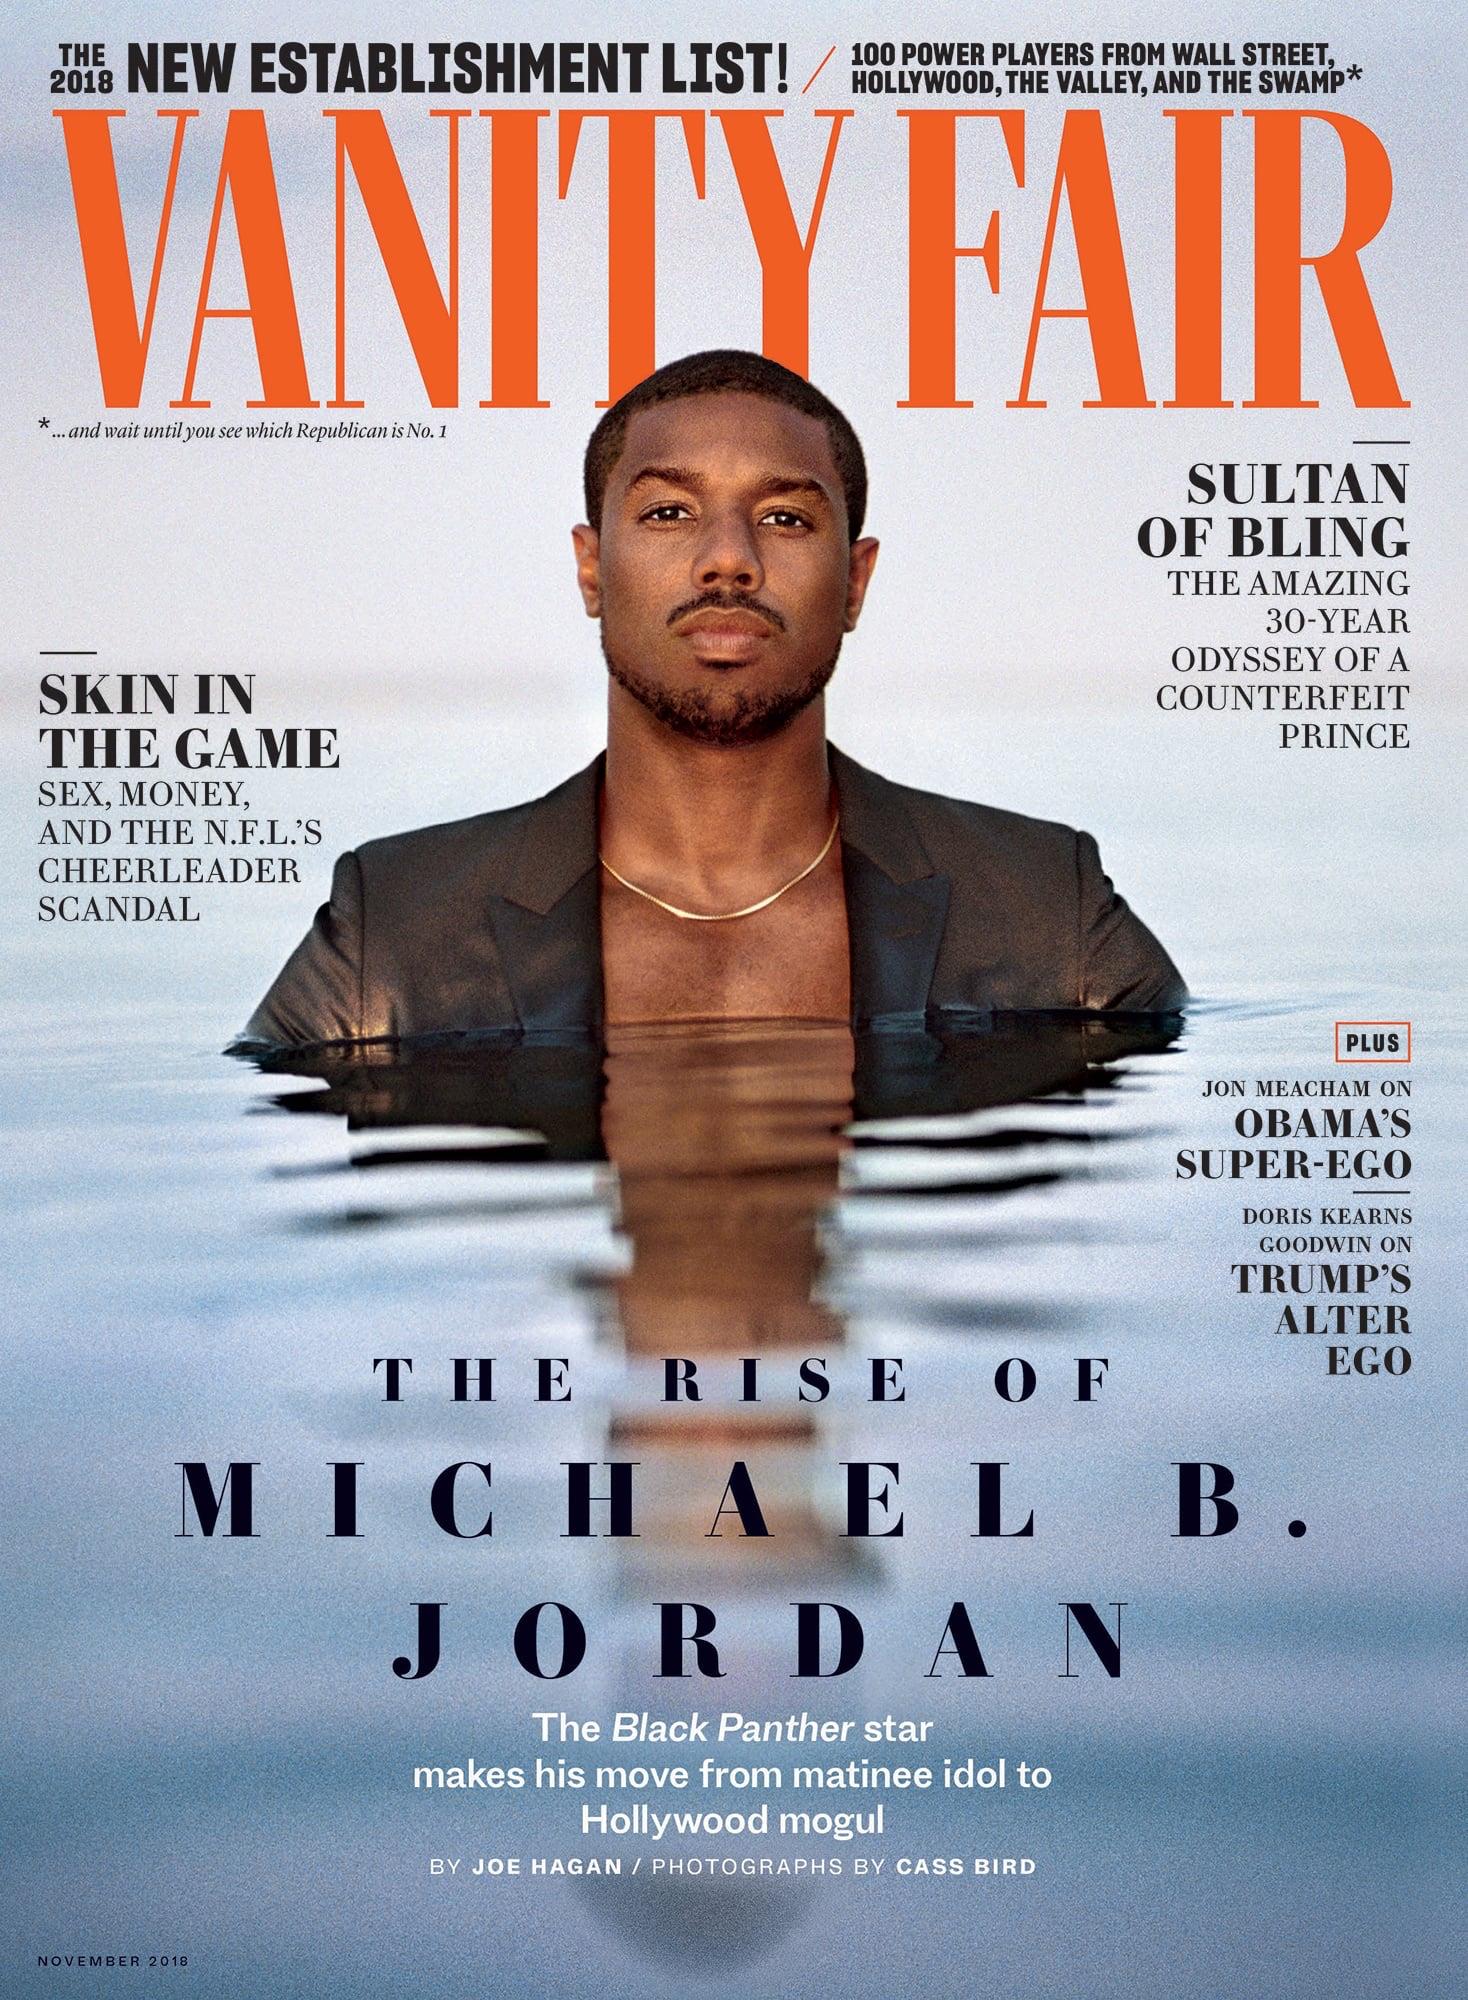 Vanity Fair cover with Michael B. Jordan in a black suit jacket in water at shoulder height